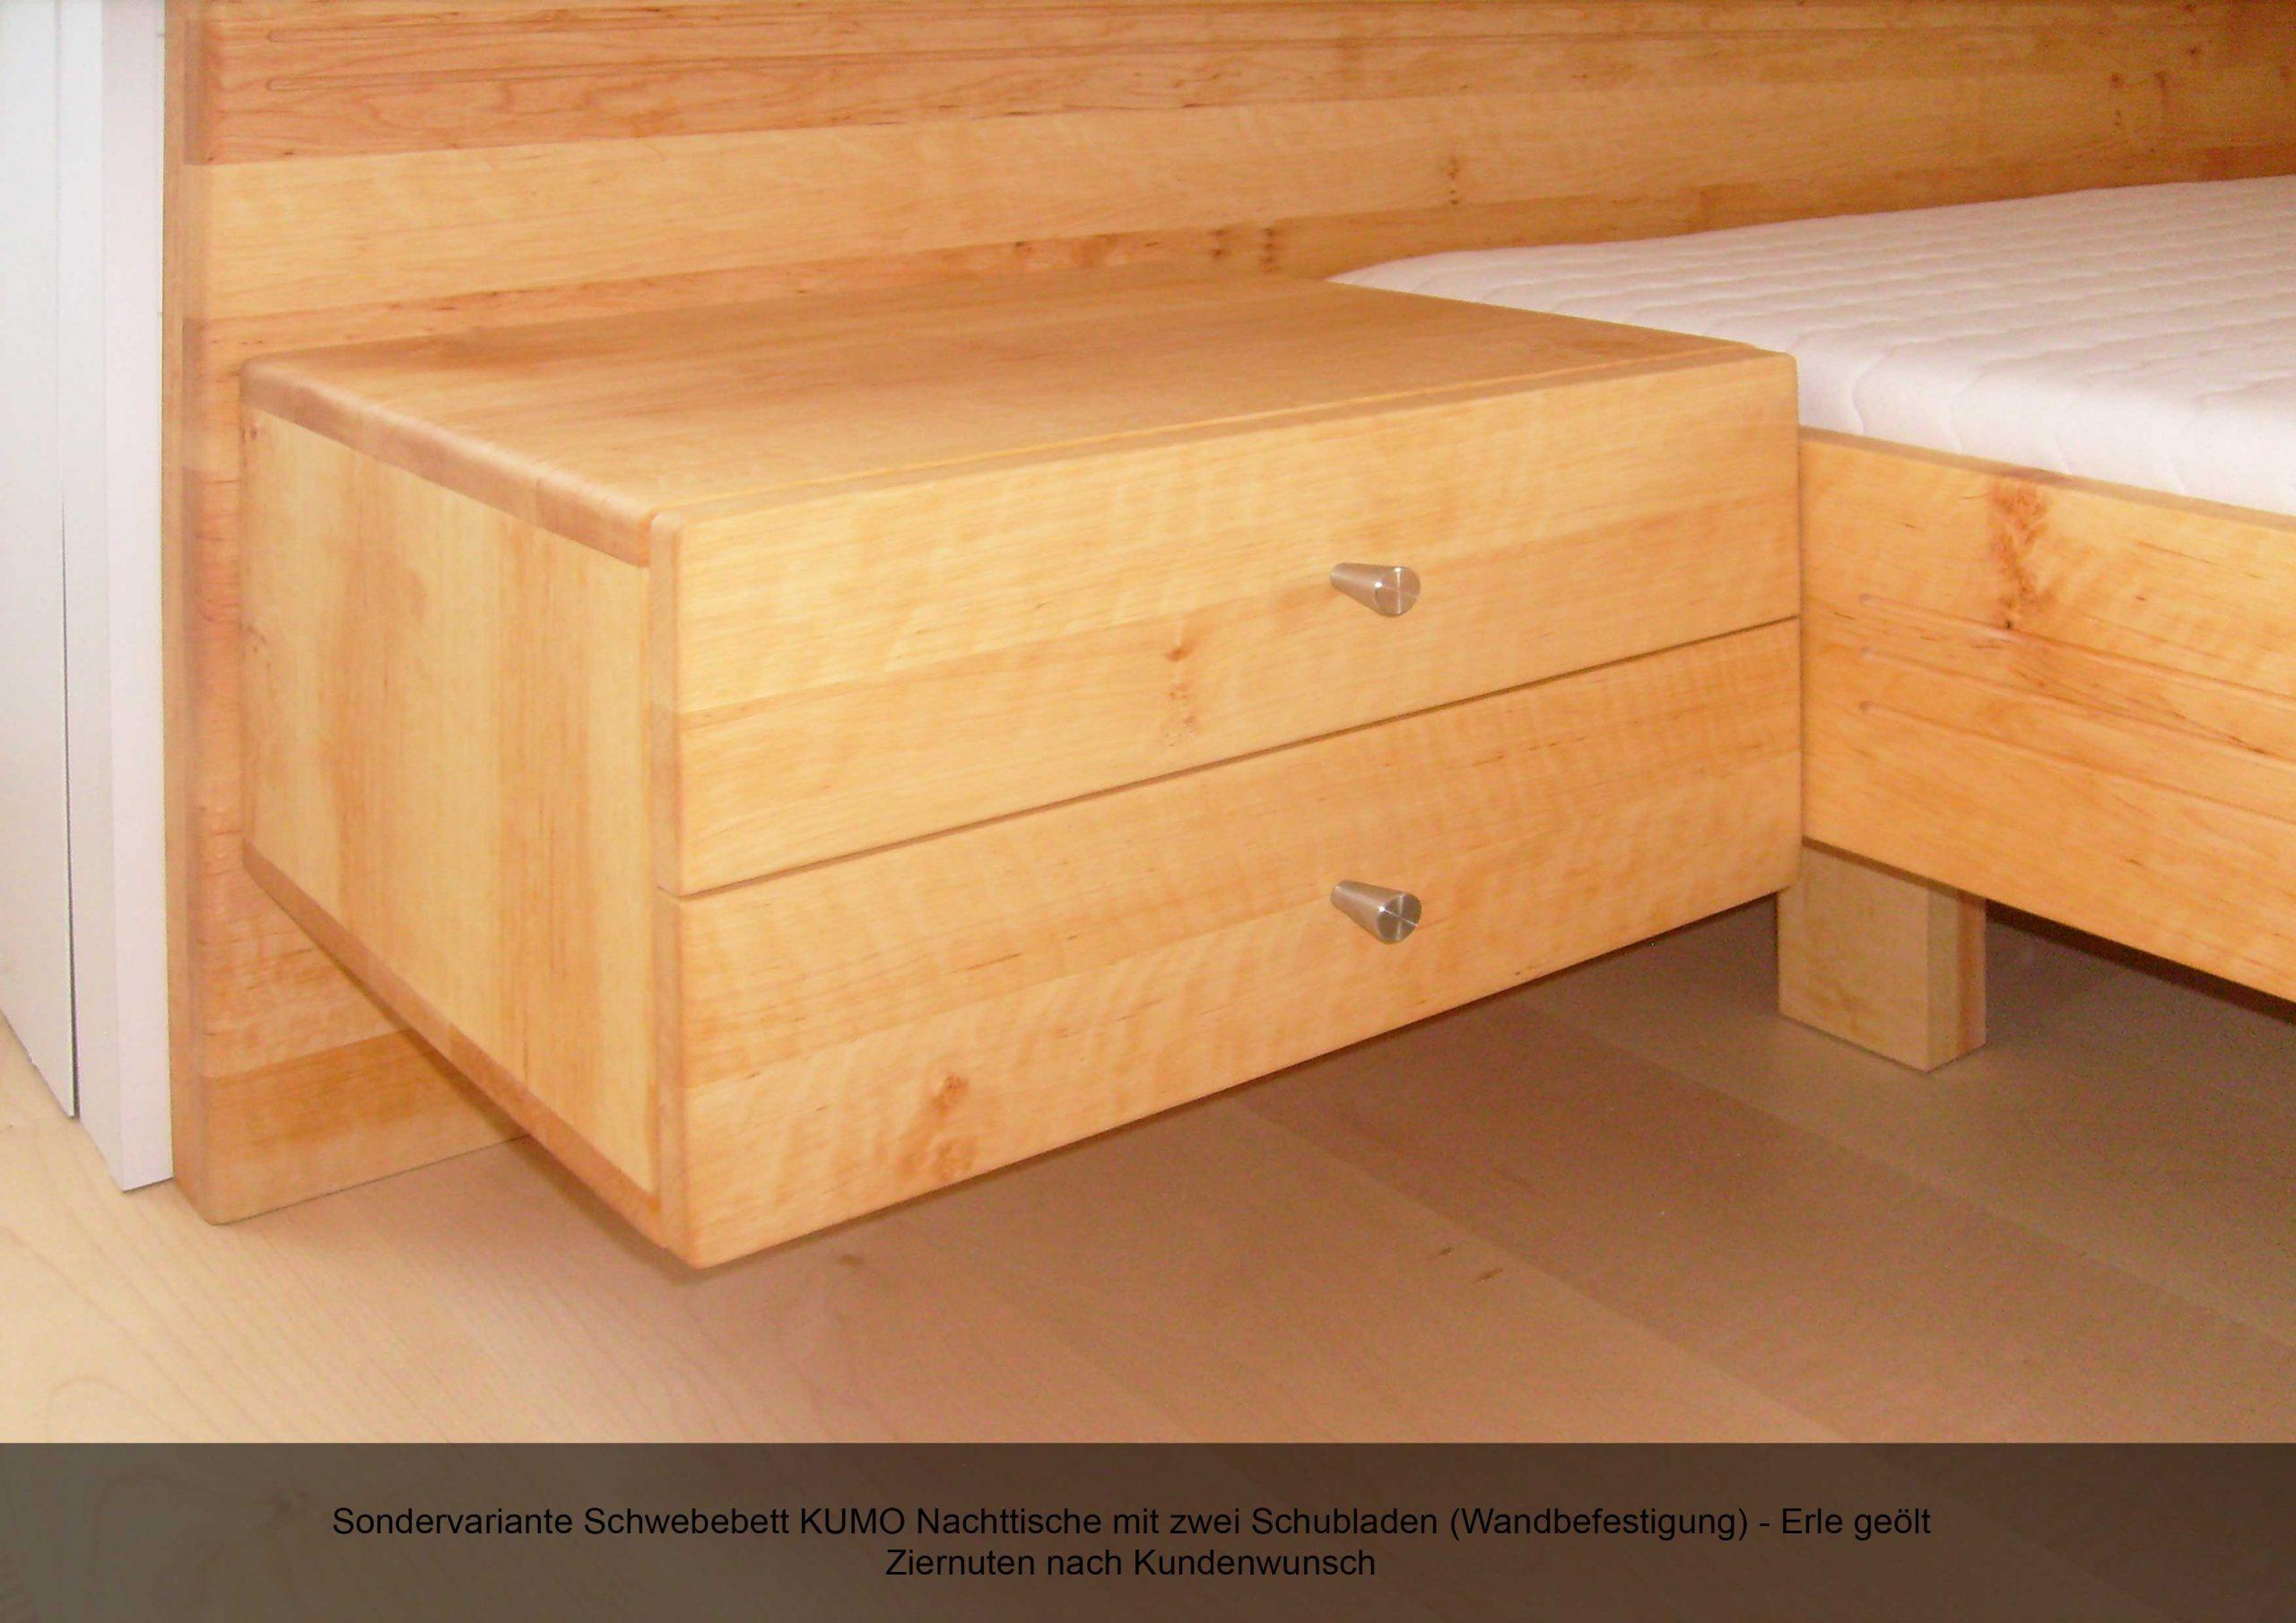 Kundenwunsch Sonderanfertigung Massarbeit Schwebebett Nachttisch Schublade Wandbefestigung Ziernute Erle geölt